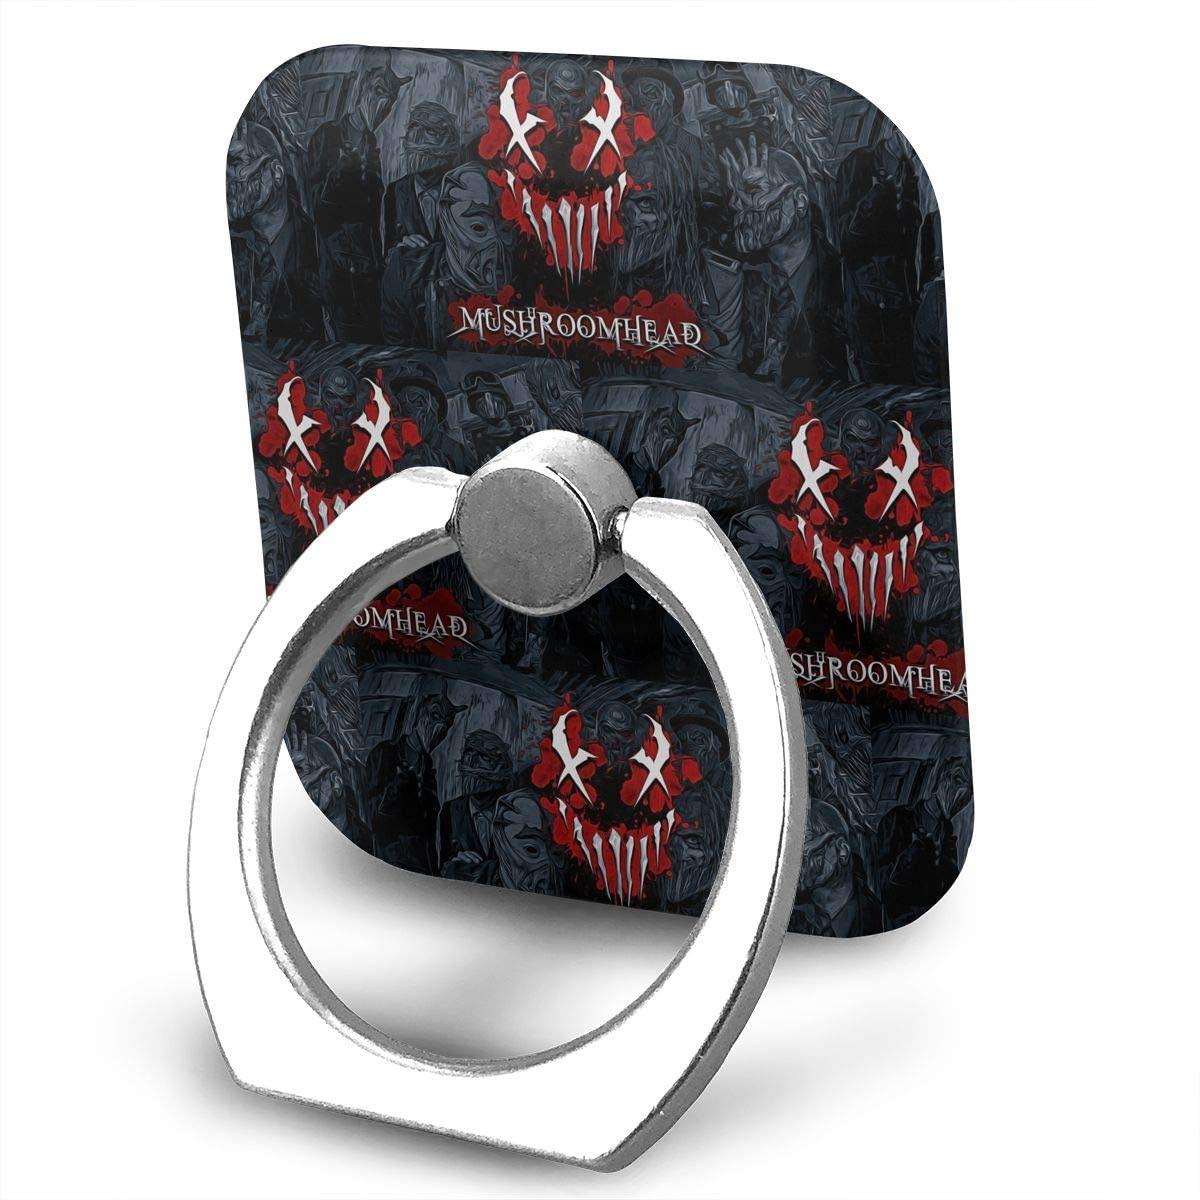 Mushroomhead Phone Finger Ring Stand Bracket Holder Smartphone Grip Stand Holder 360 Degree Rotating Sticky Cute